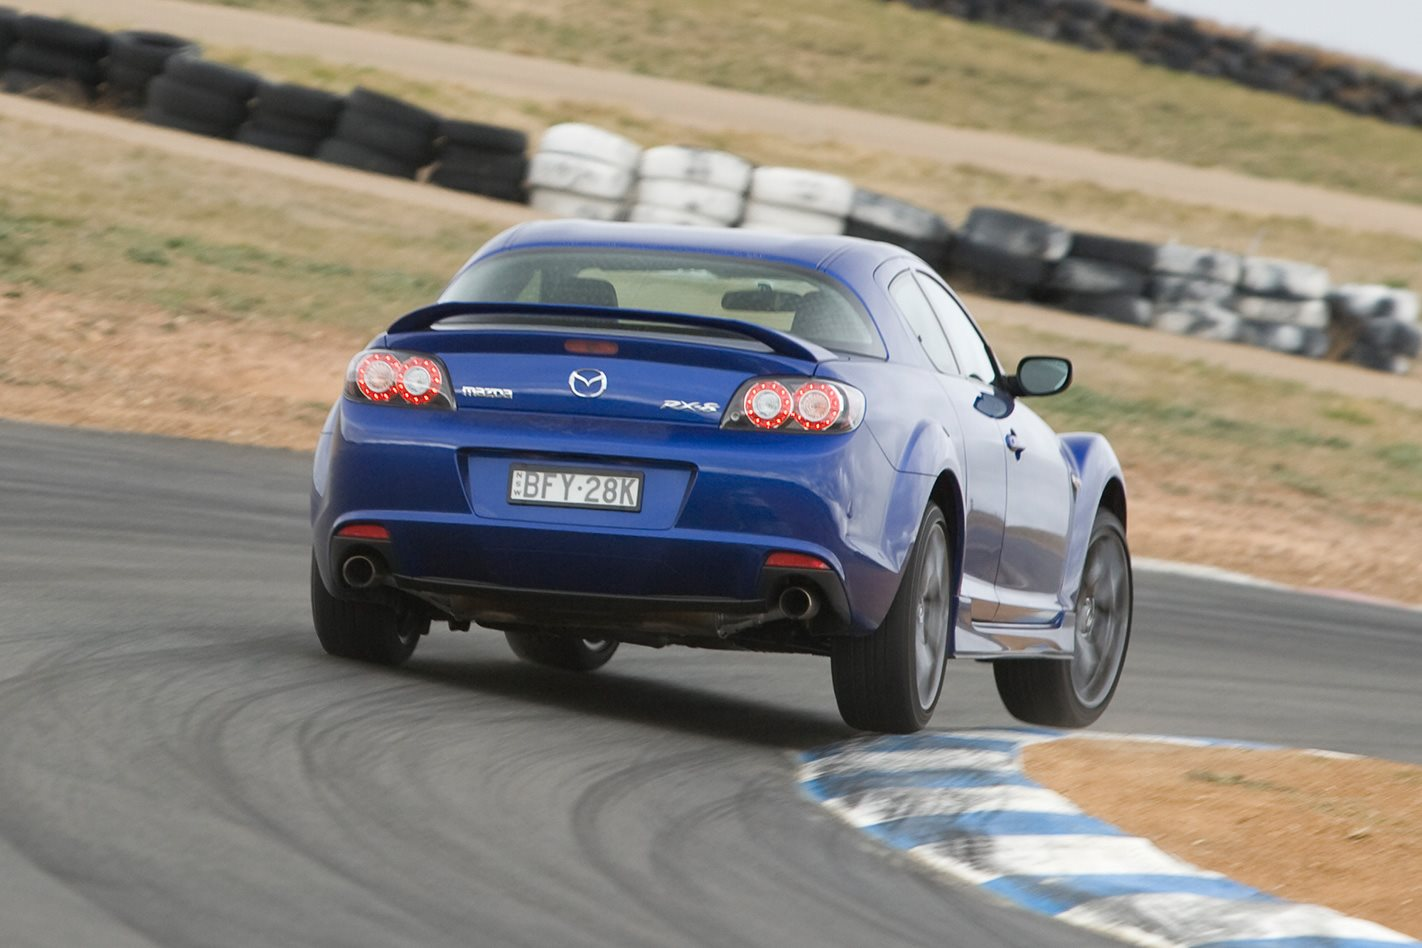 2008-Mazda-RX-8-GT-rear.jpg